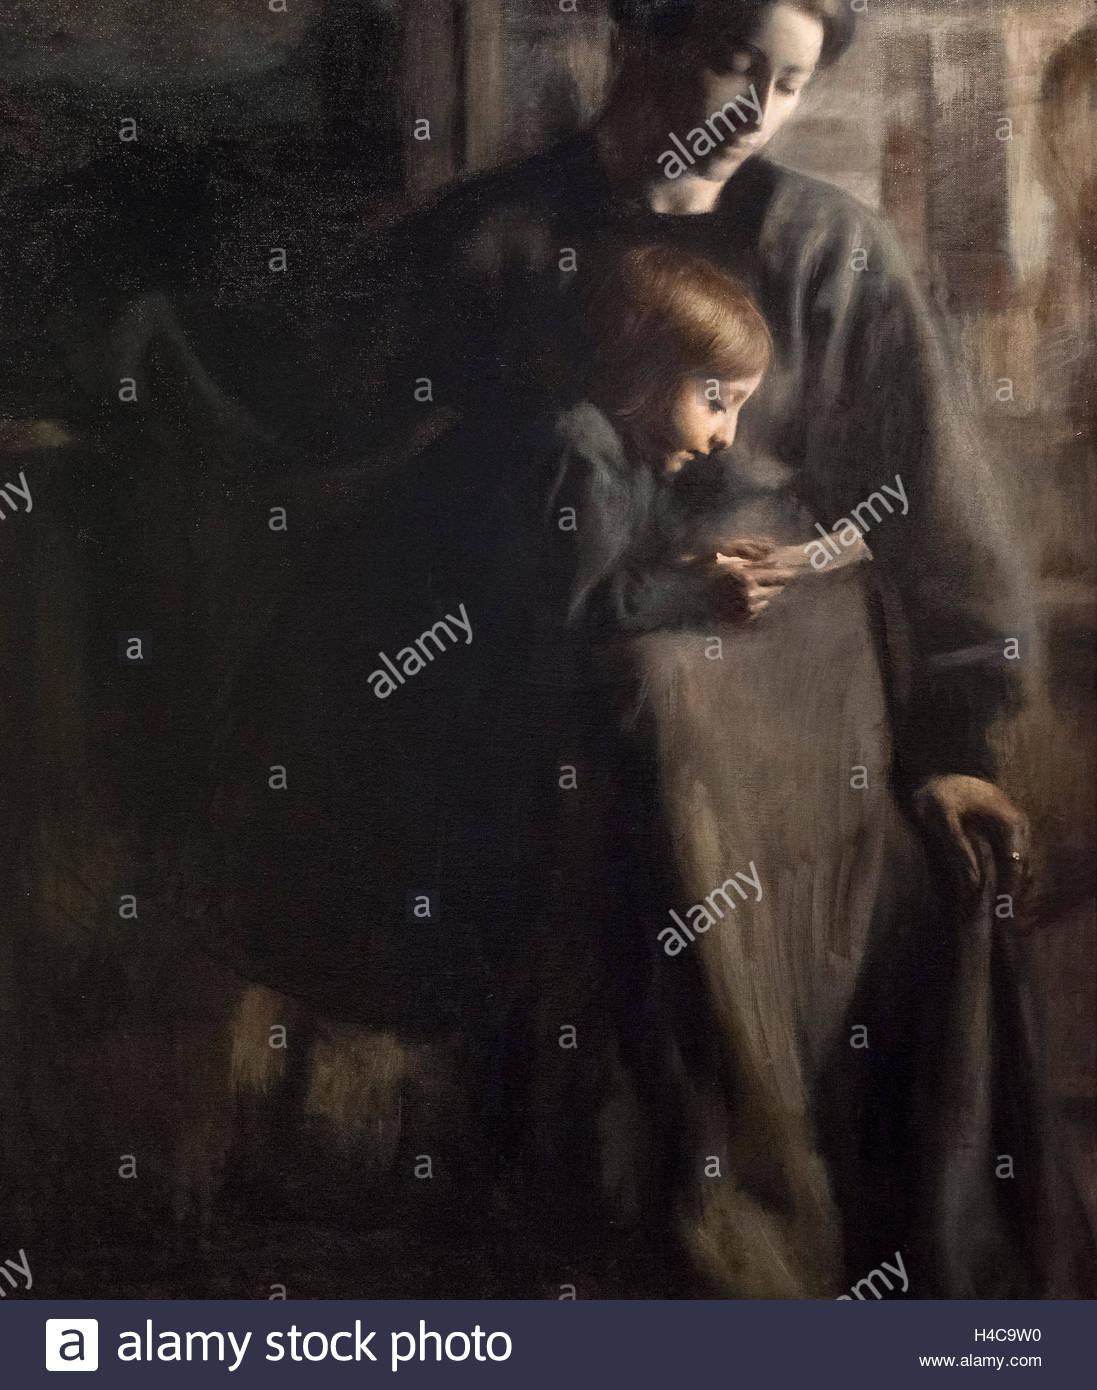 Giacomo Balla (1871-1958), Affetti (1910), detail. Affections. - Stock Image